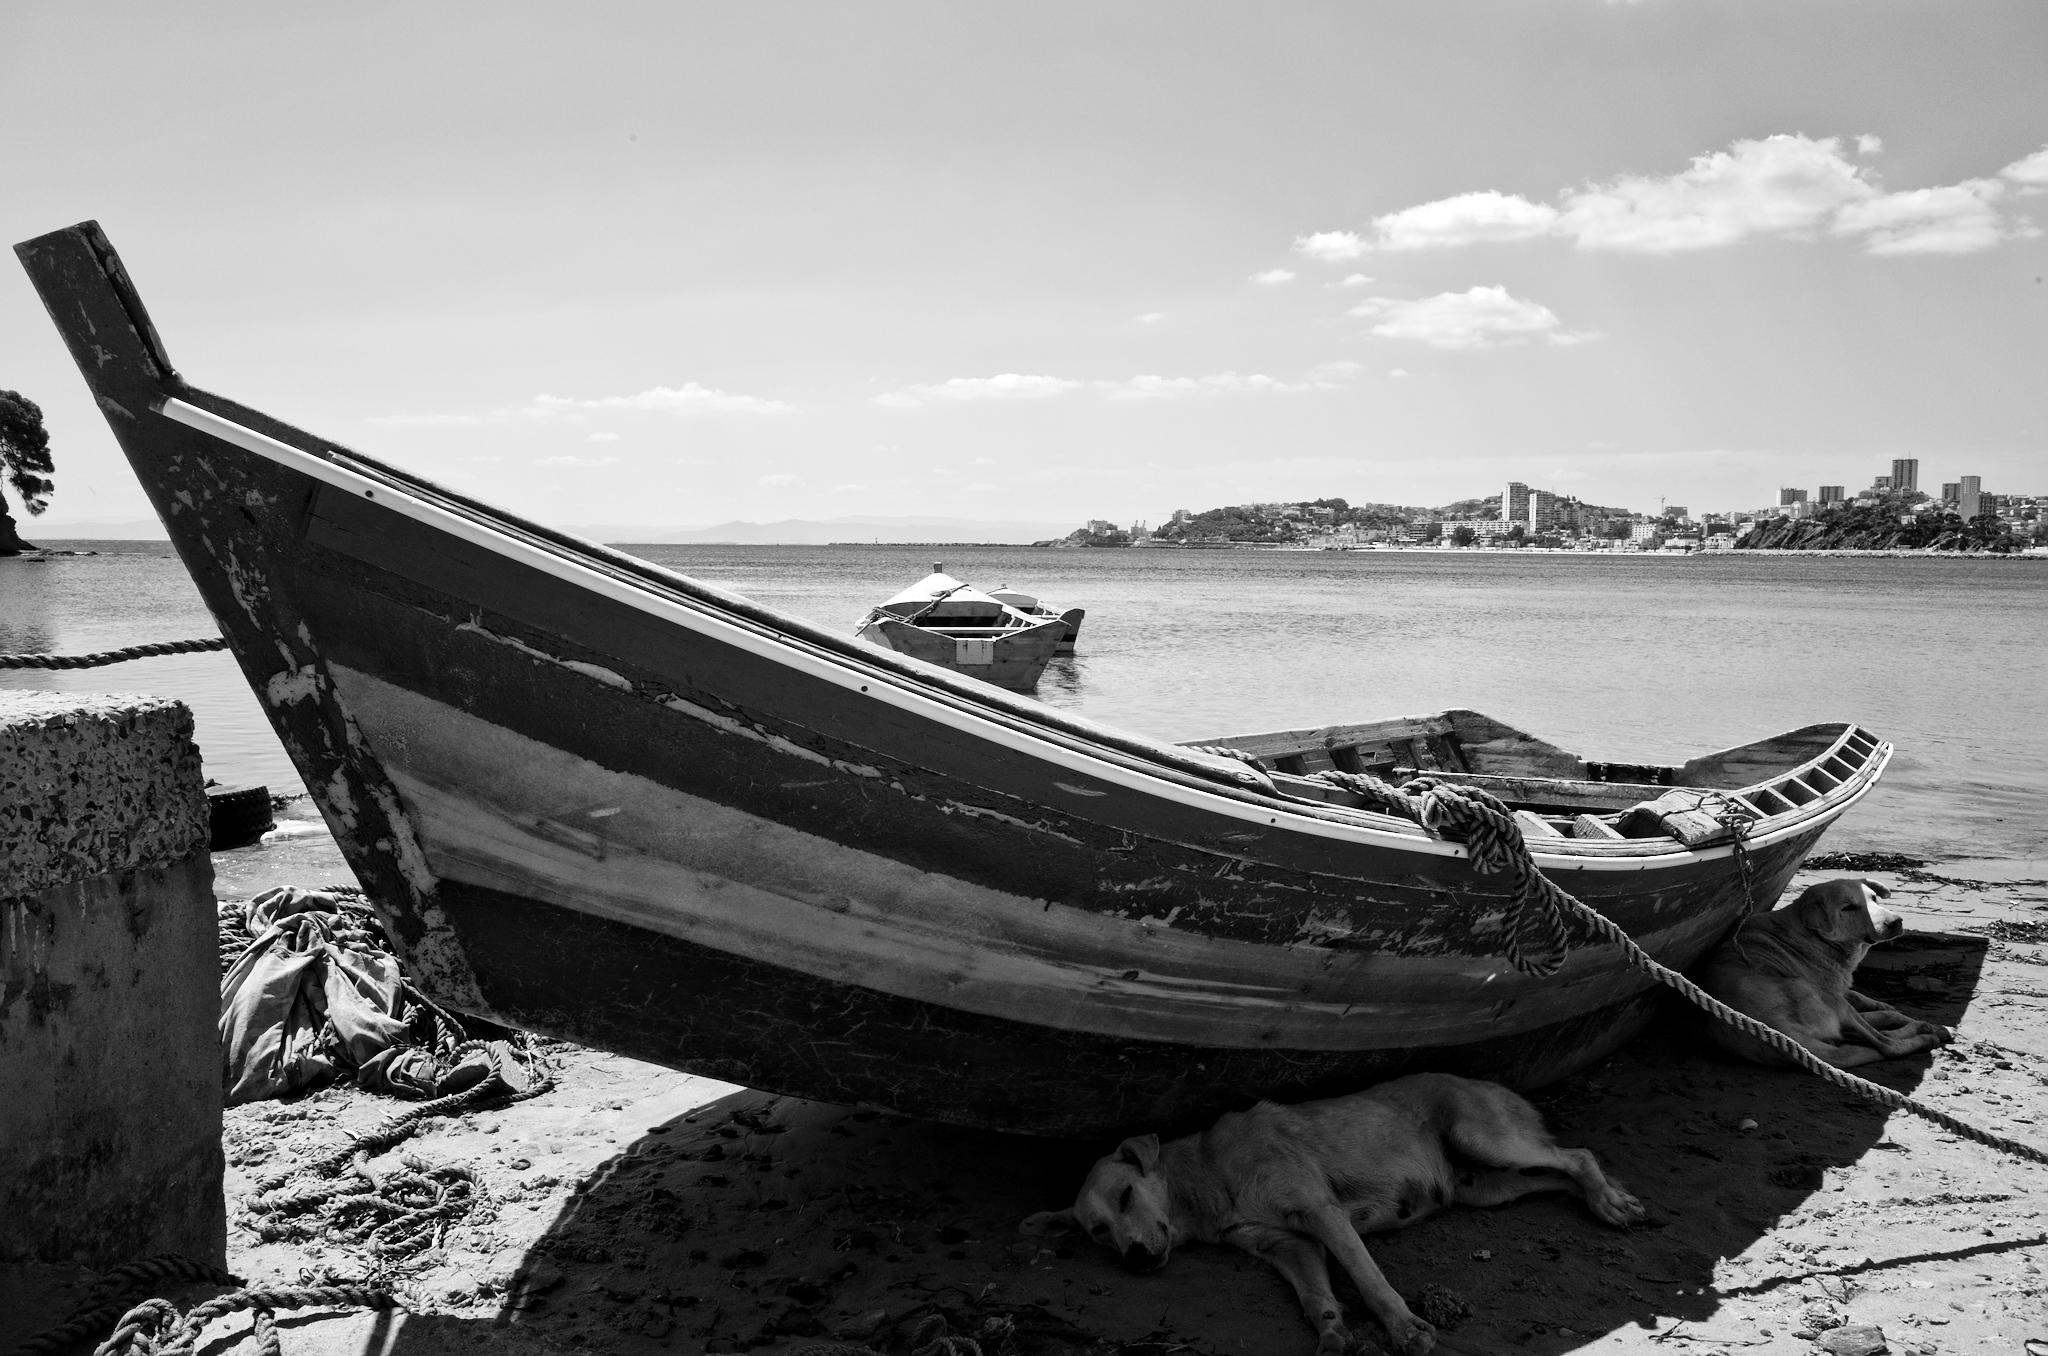 Un lieu #4 – Annaba, Algérie